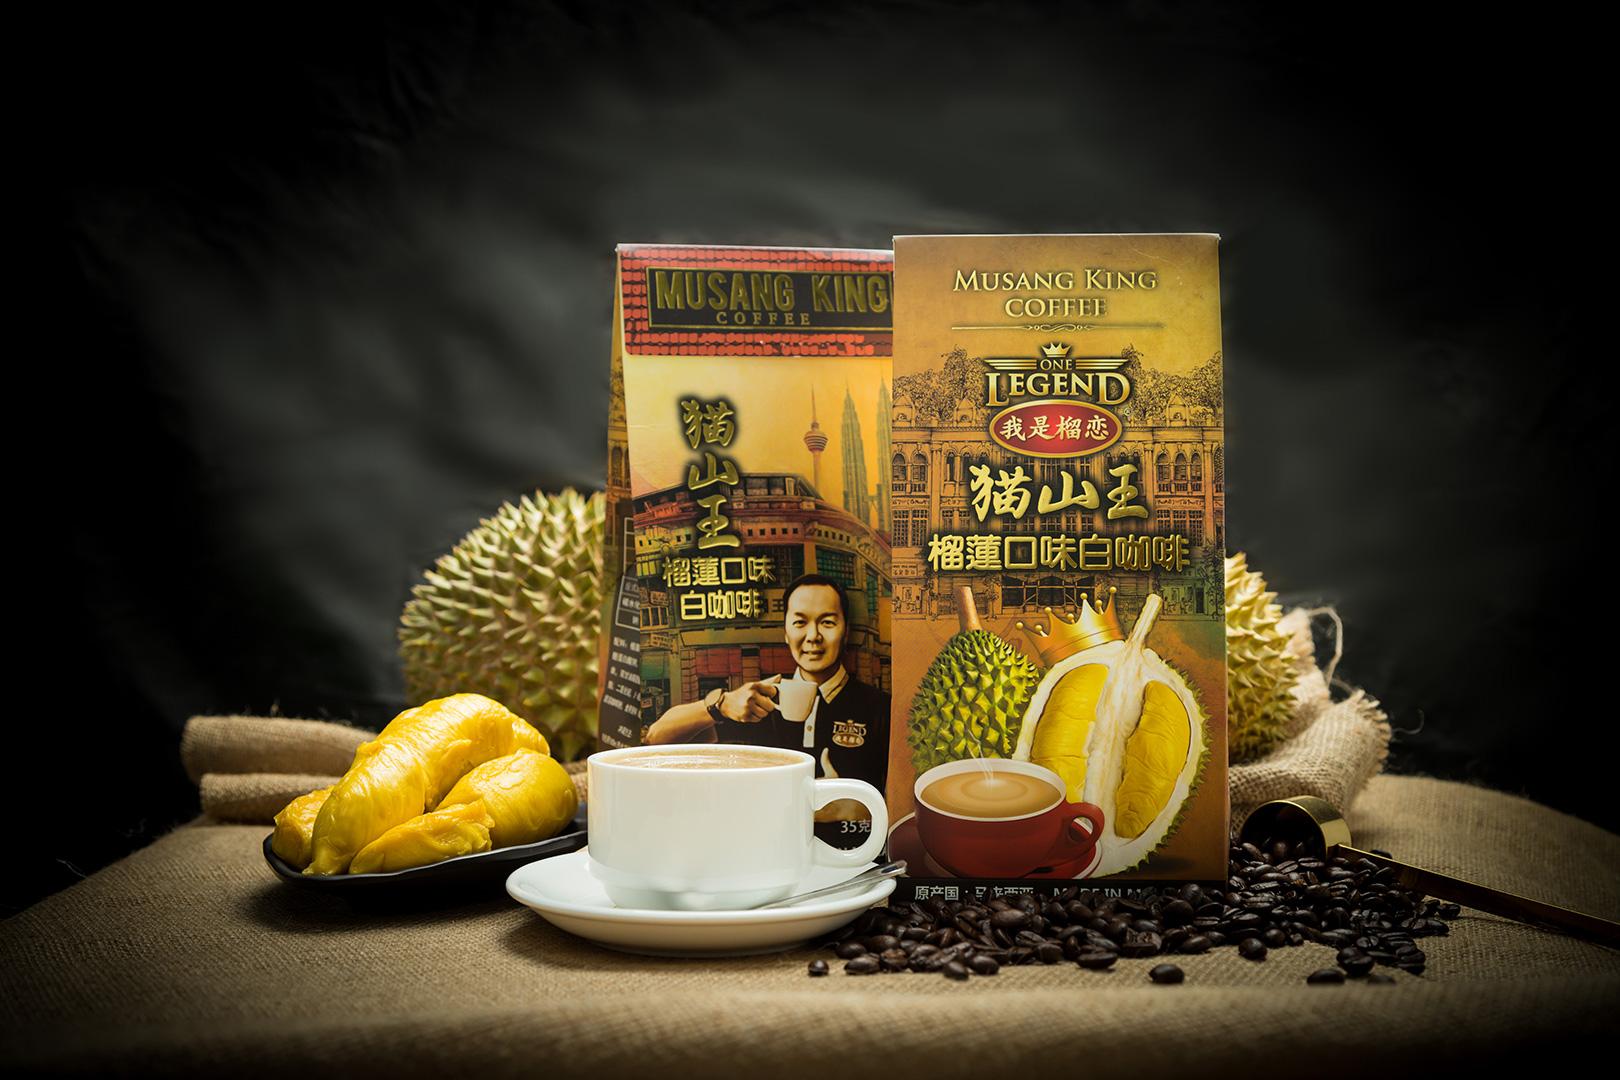 猫山王白咖啡 Musang King White Coffee